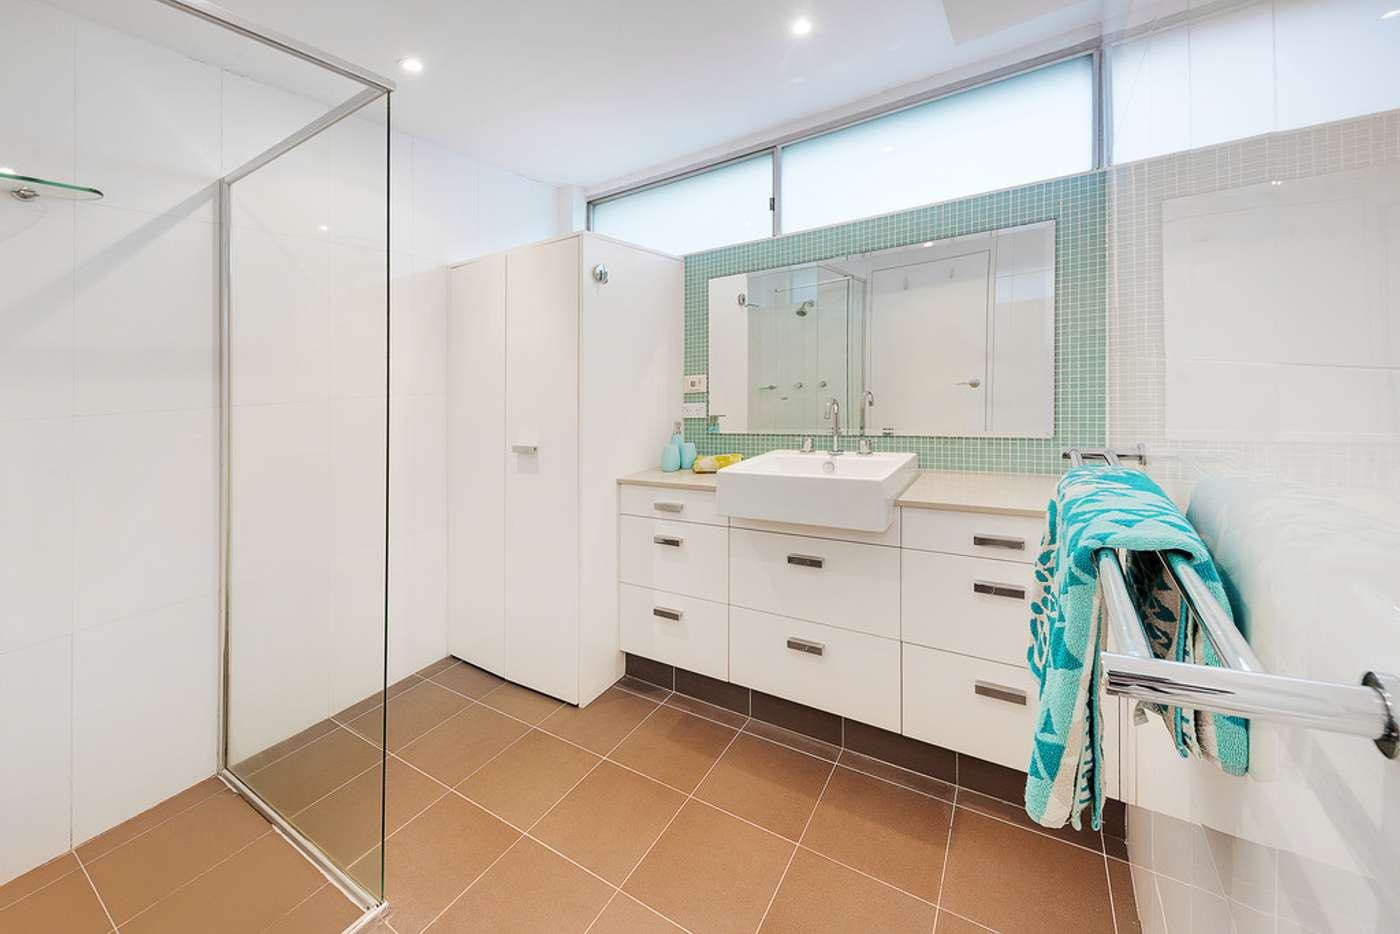 Seventh view of Homely apartment listing, 3/74 Upper Pitt Street, Kirribilli NSW 2061